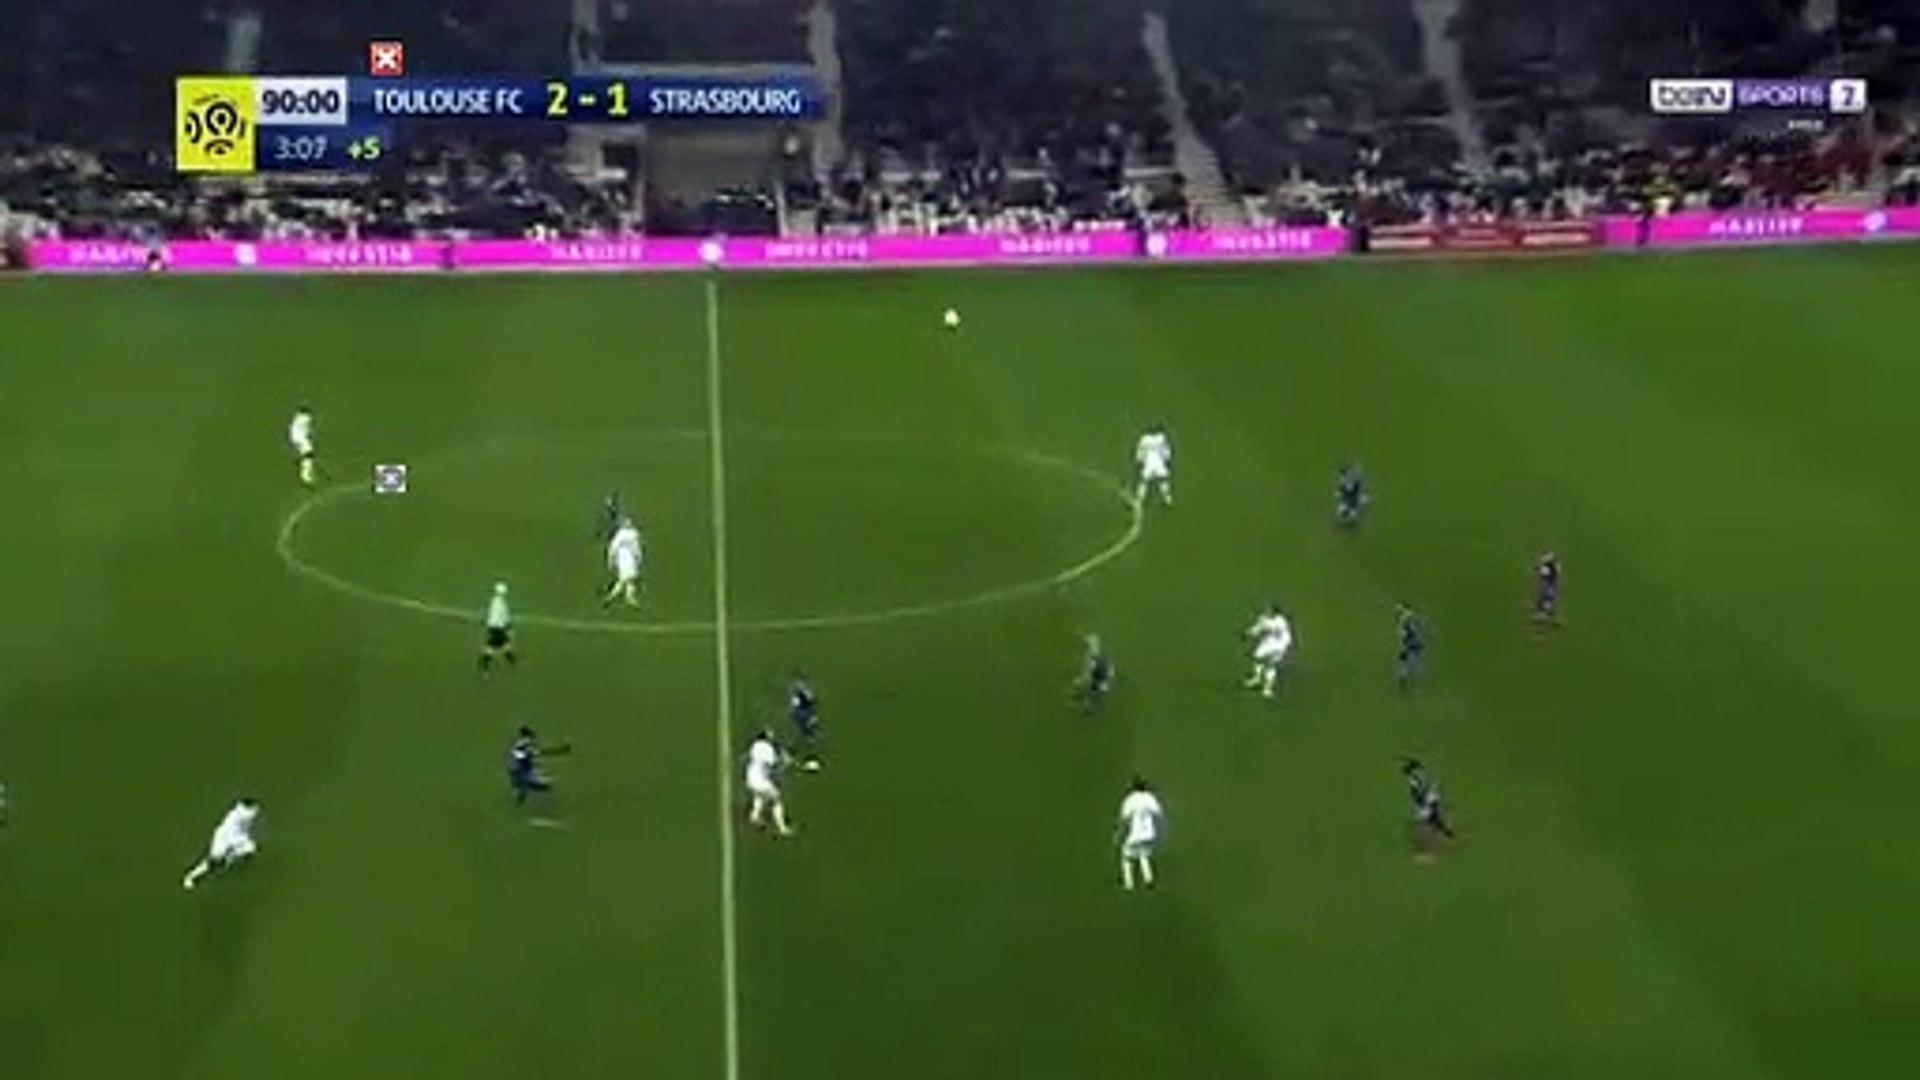 Yaya Sanogo Goal HD - Toulouse 2-1 Strasbourg 17.03.2018